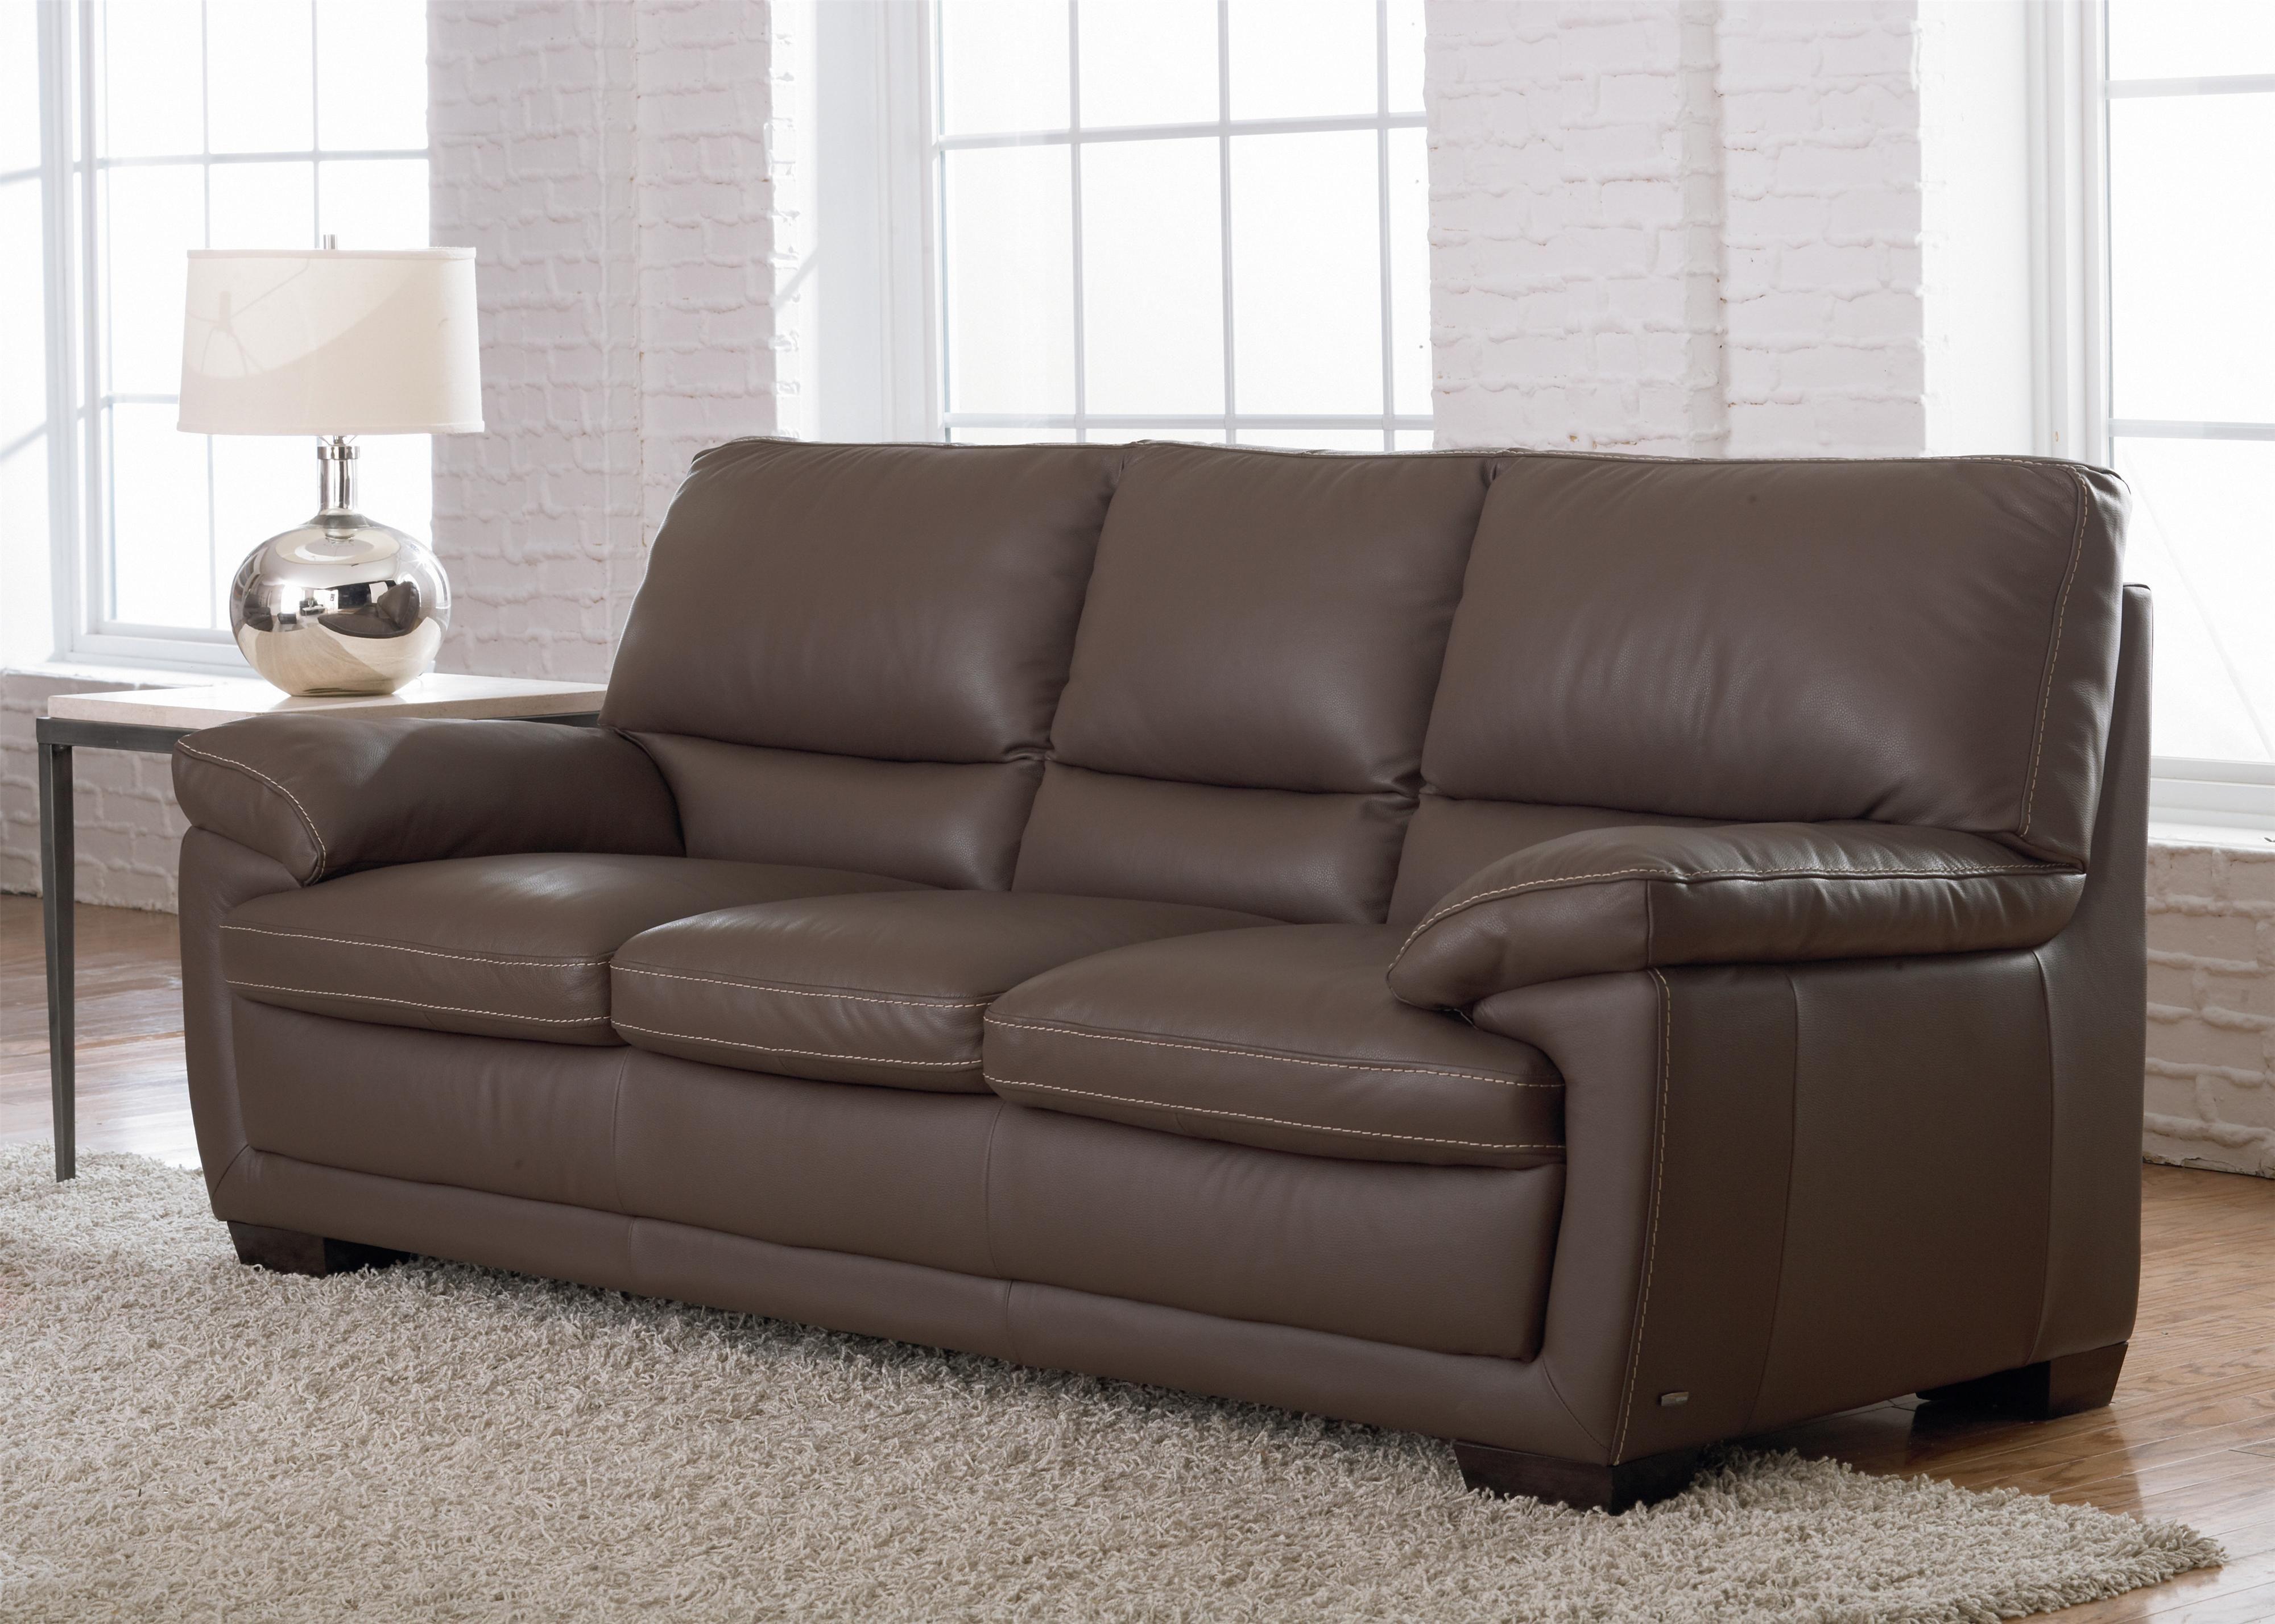 B674 Stationary Sofa By Natuzzi Editions At Becker Furniture World